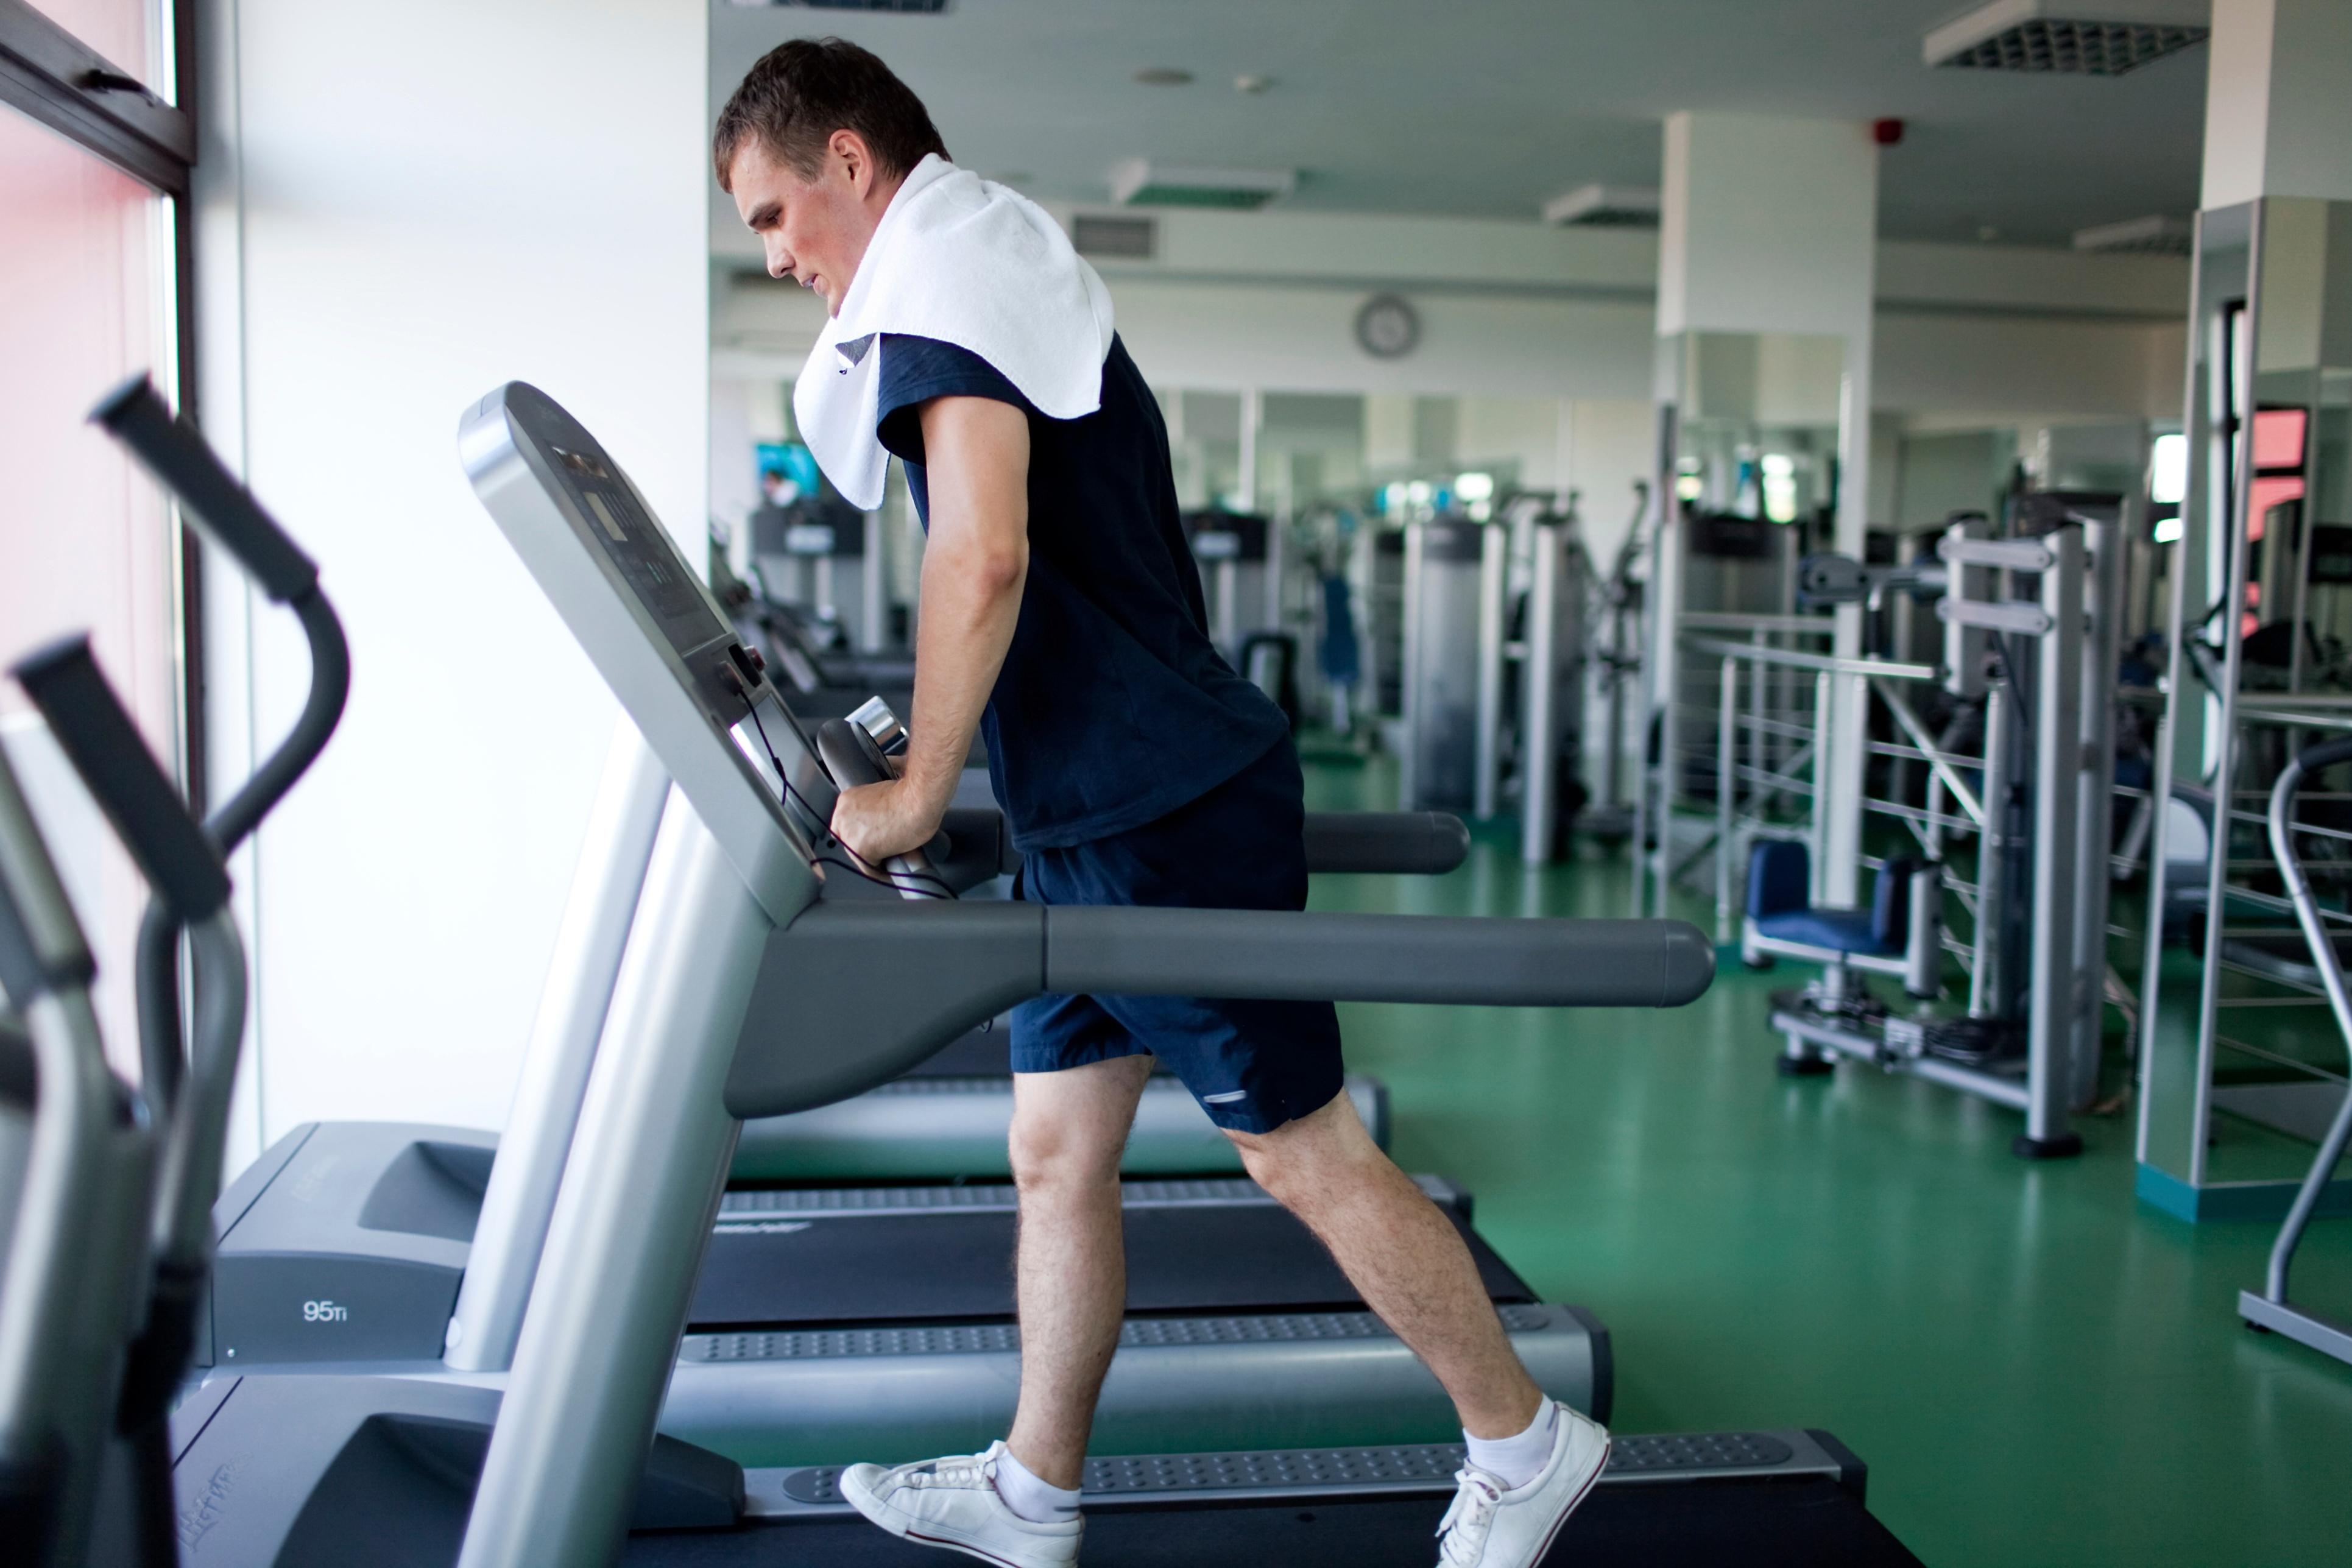 murphyprachthauser-treadmill-injury